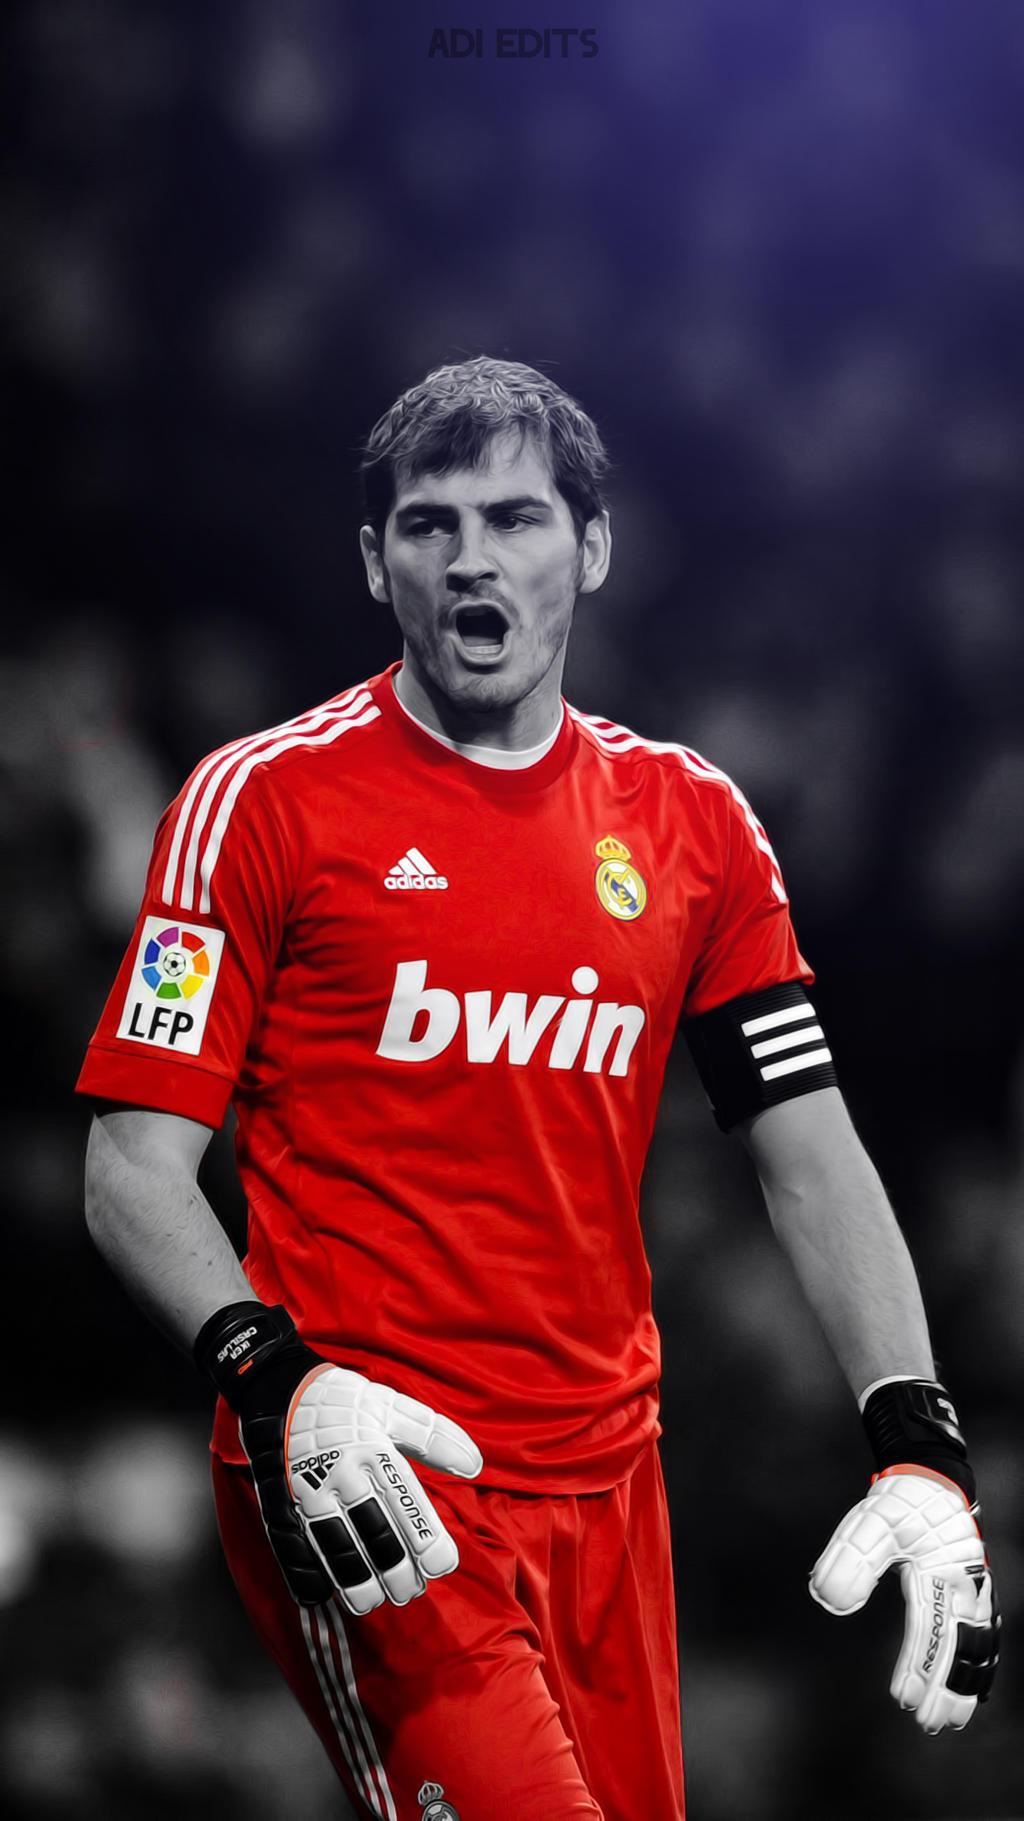 Iker Casillas Real Madrid Wallpaper By Adi 149